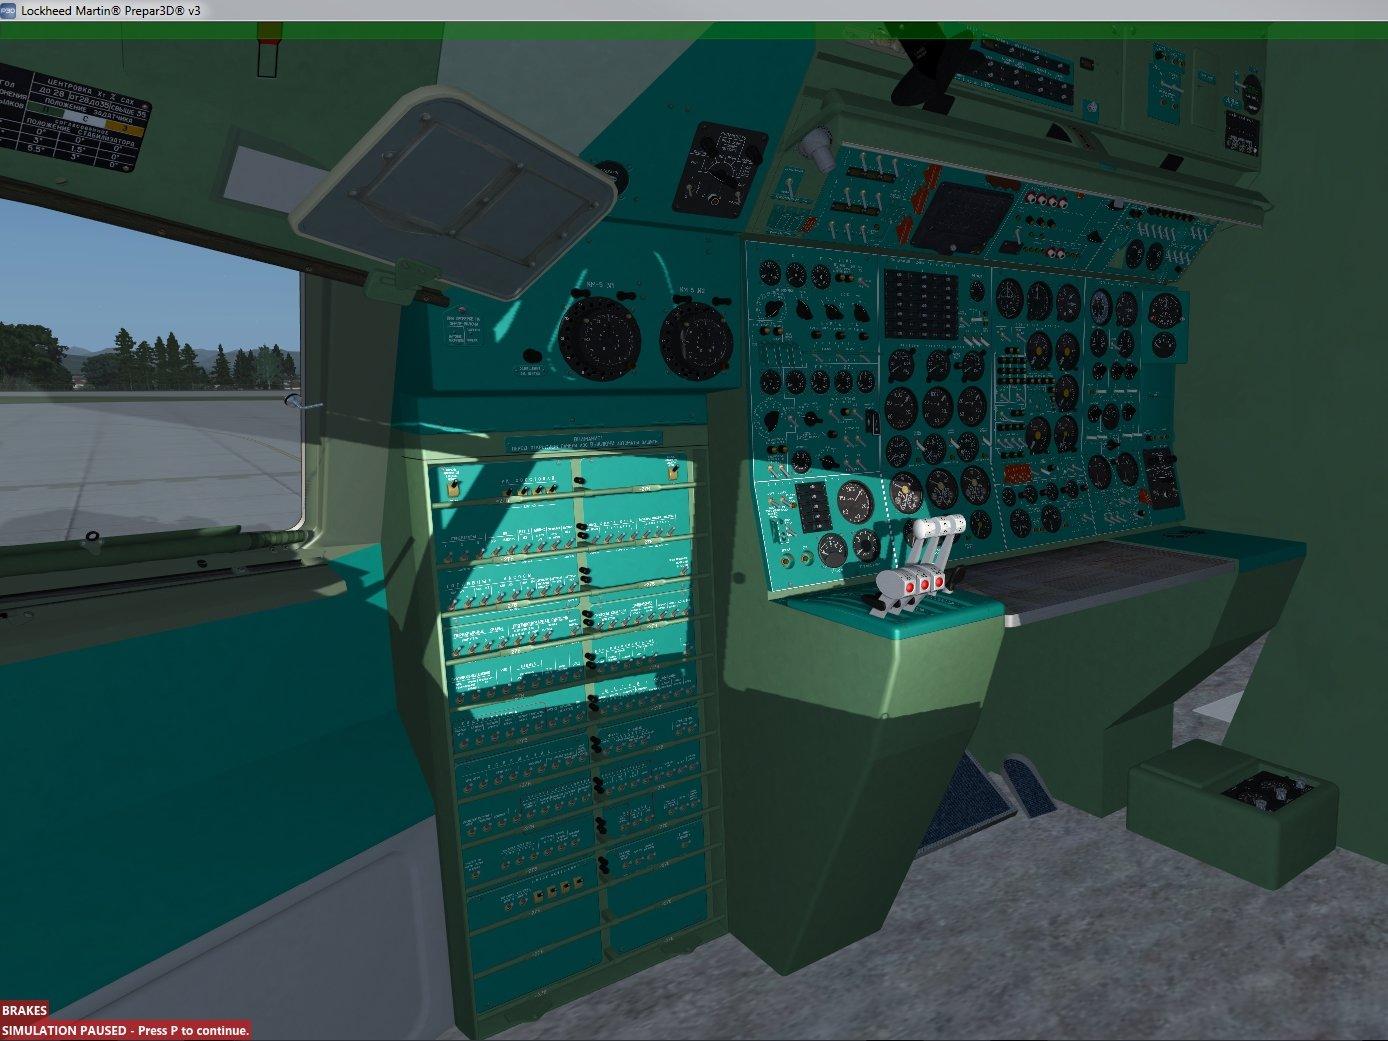 468781890_2019-10-0311_50_36-LockheedMartinPrepar3Dv3.jpg.62f88d04b41c9830c62b21b3c0568a50.jpg